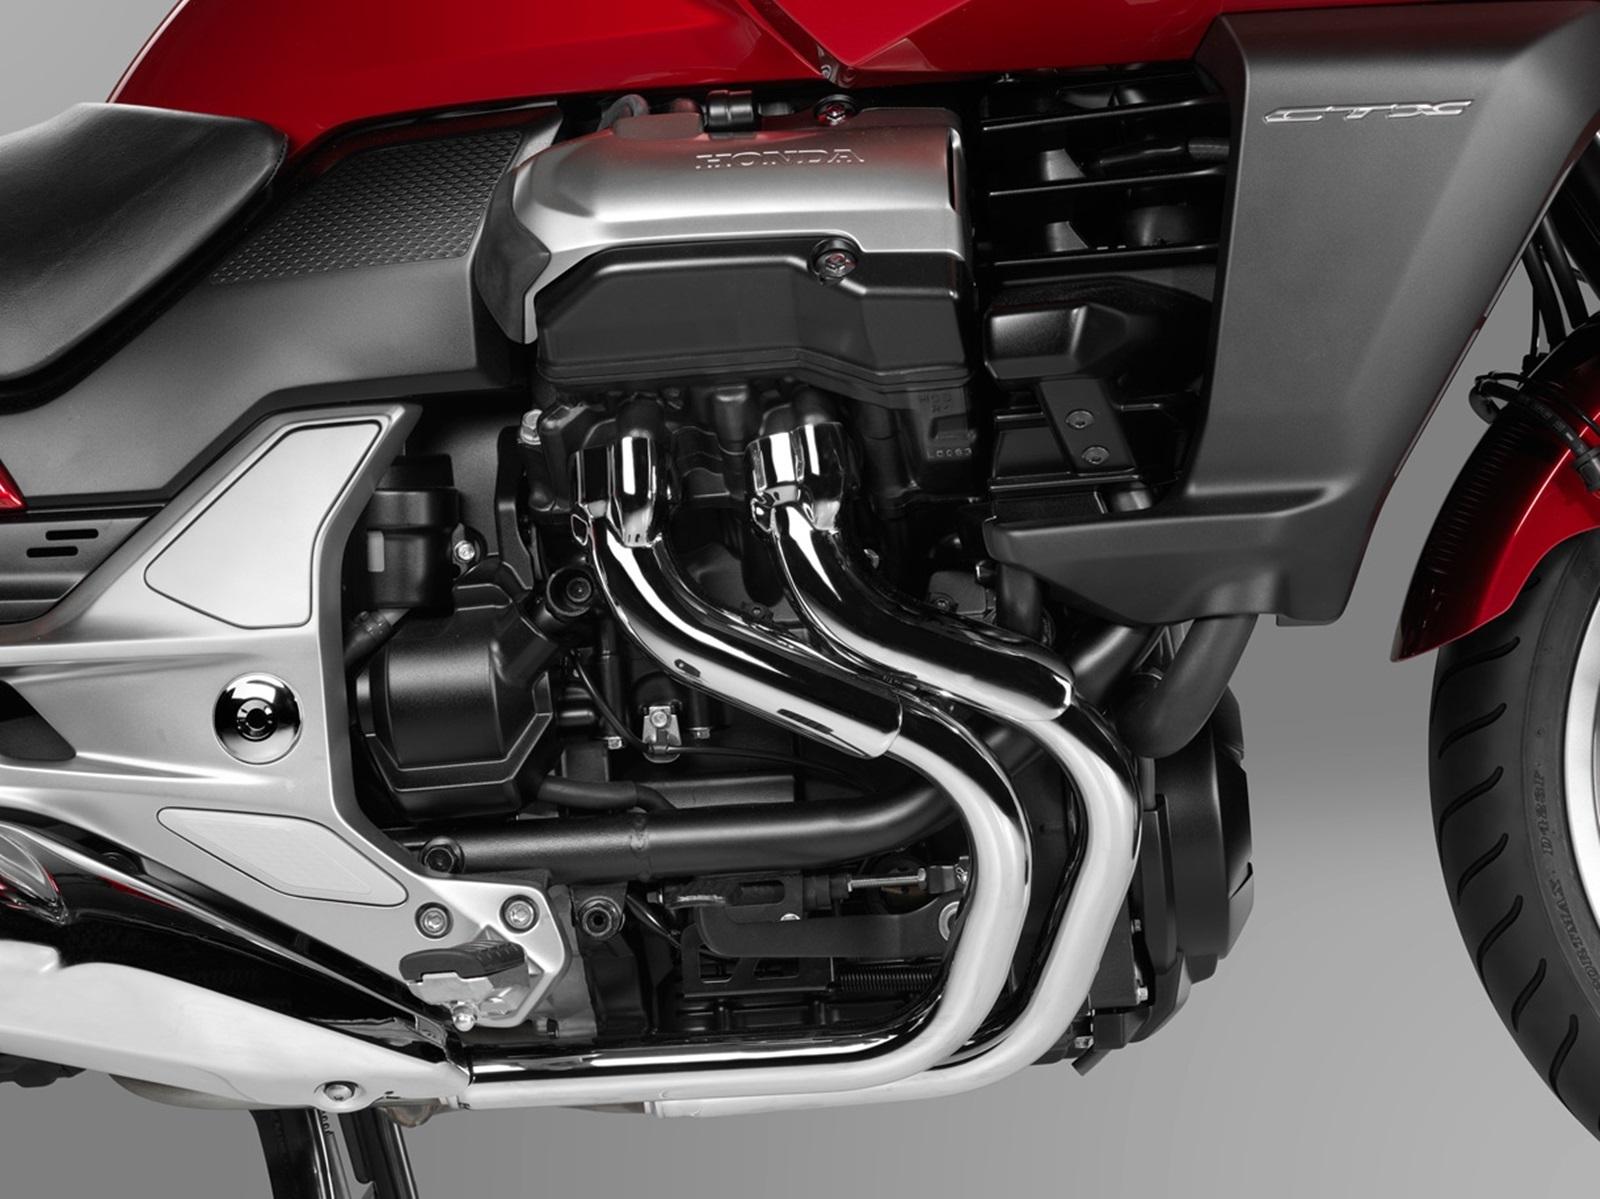 Foto de Honda VTX 1300 en detalle (10/20)